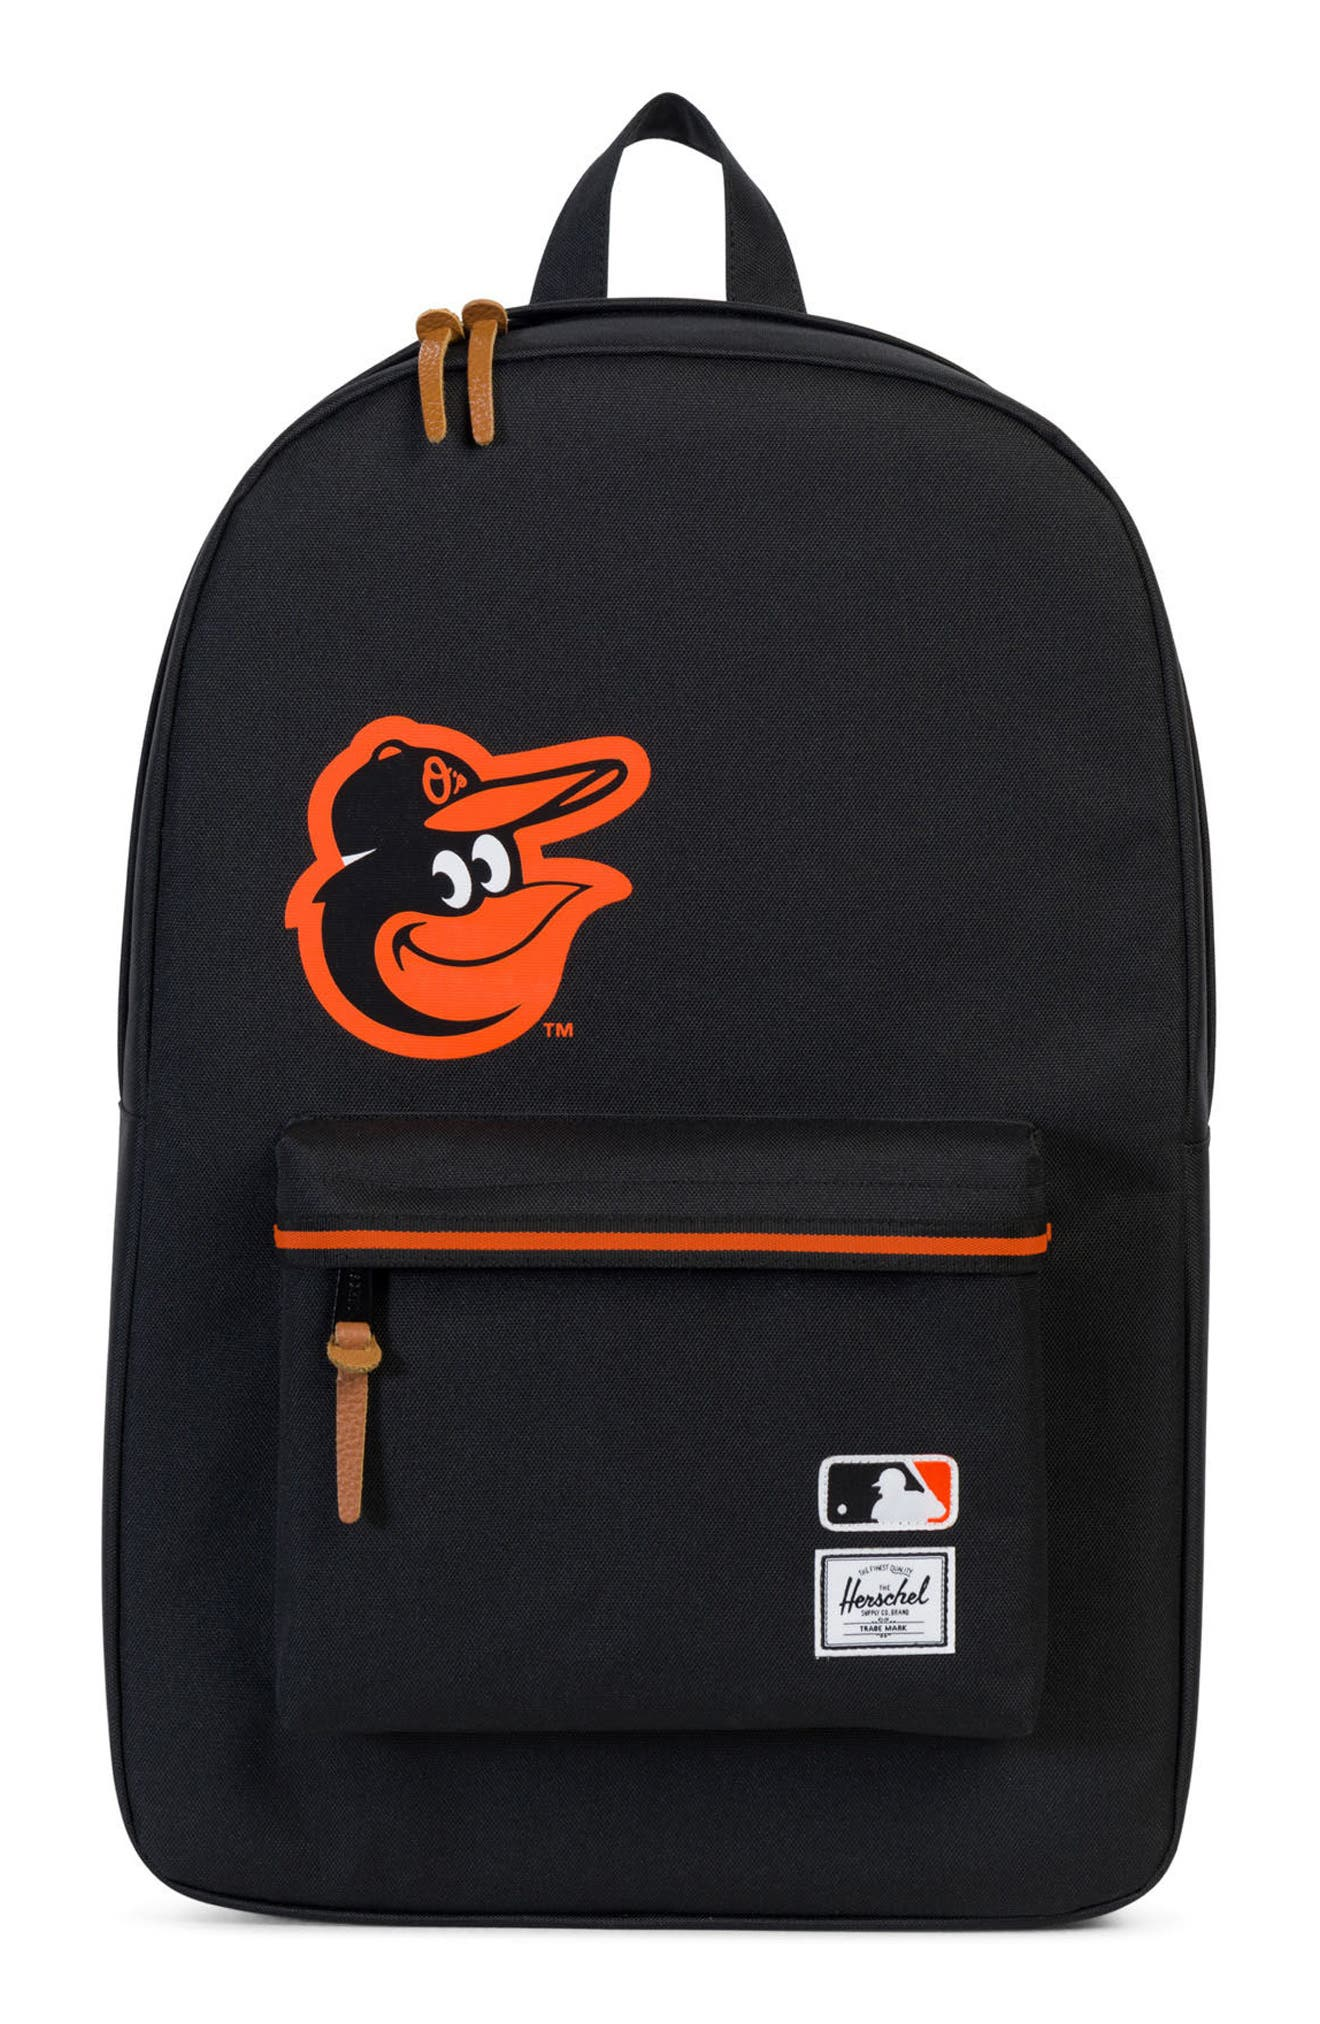 Heritage - MLB American League Backpack,                             Main thumbnail 1, color,                             001